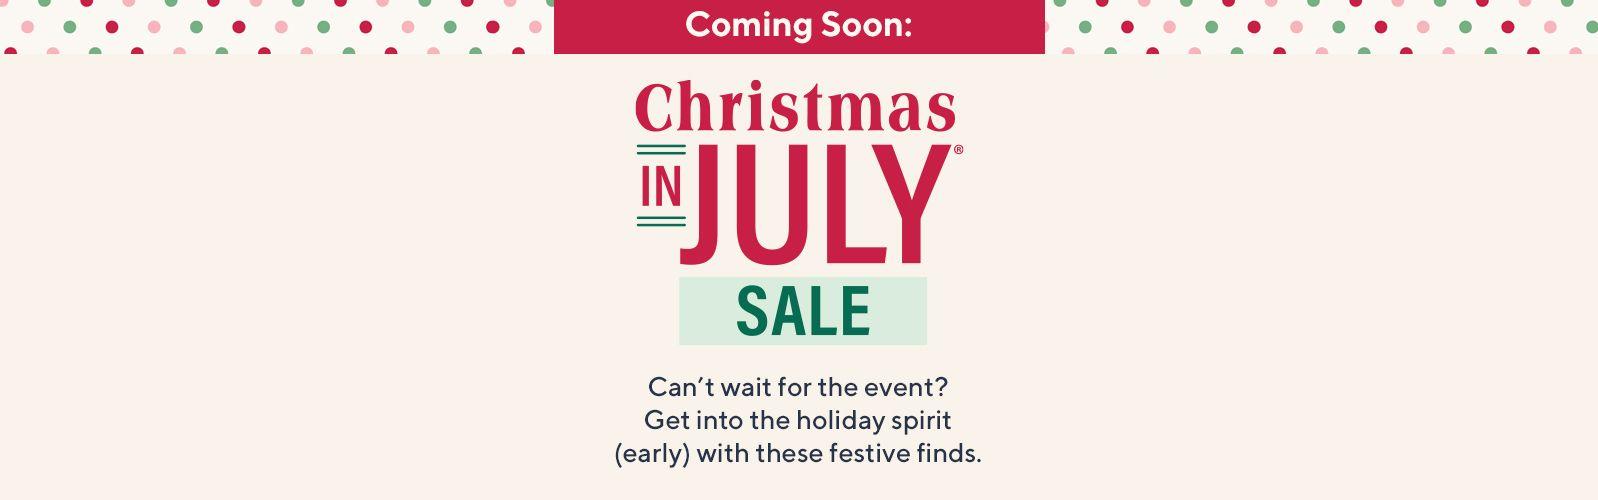 Qvc Schedule Christmas In July 2021 Dkzqhr9dakzqvm